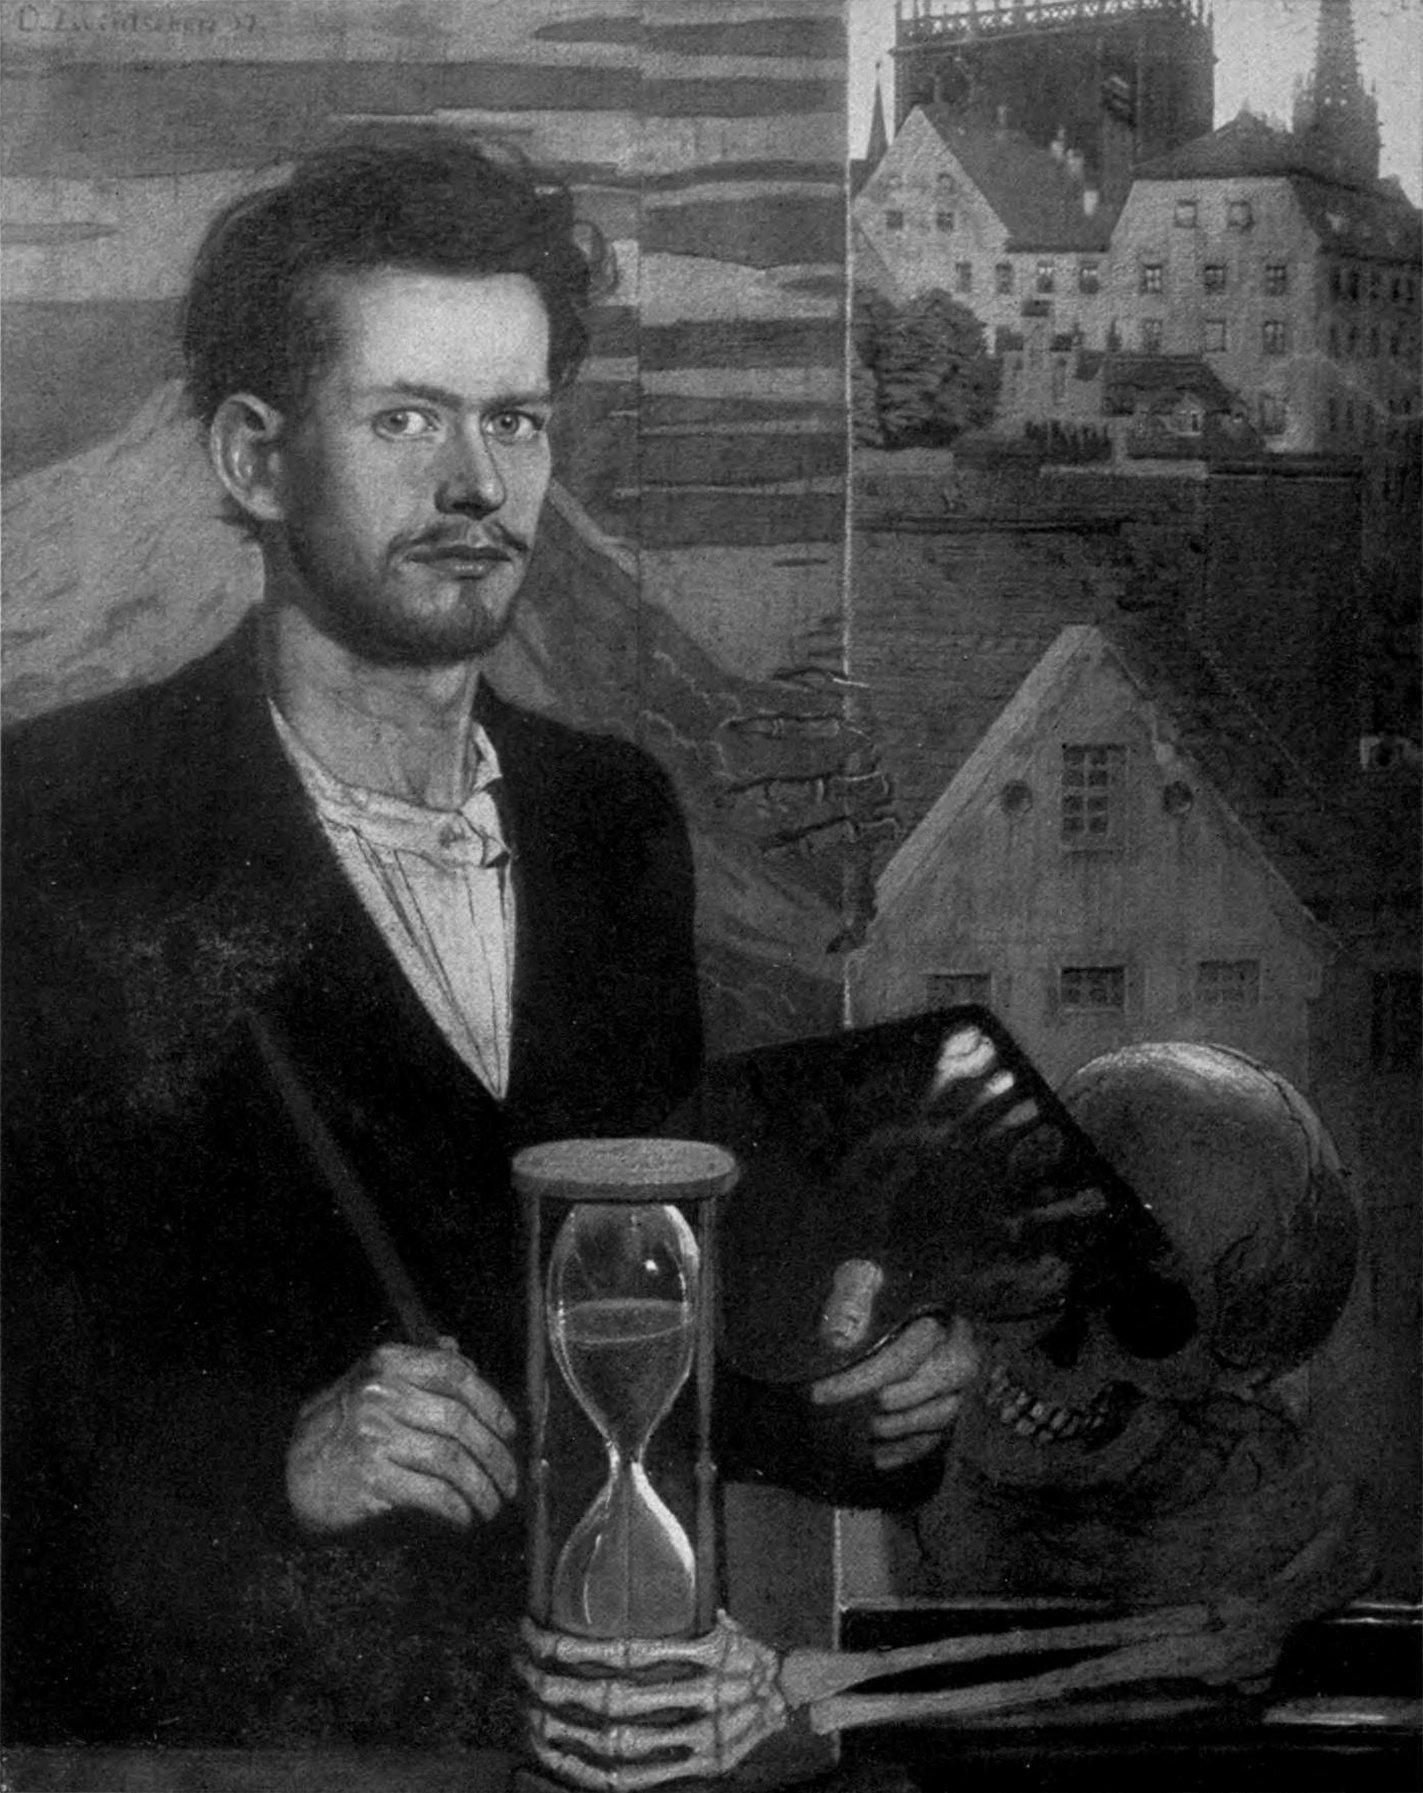 Oskar_Zwintscher 1897 Autoportrait Chemnitz, Stadtische Kunstsammlungen